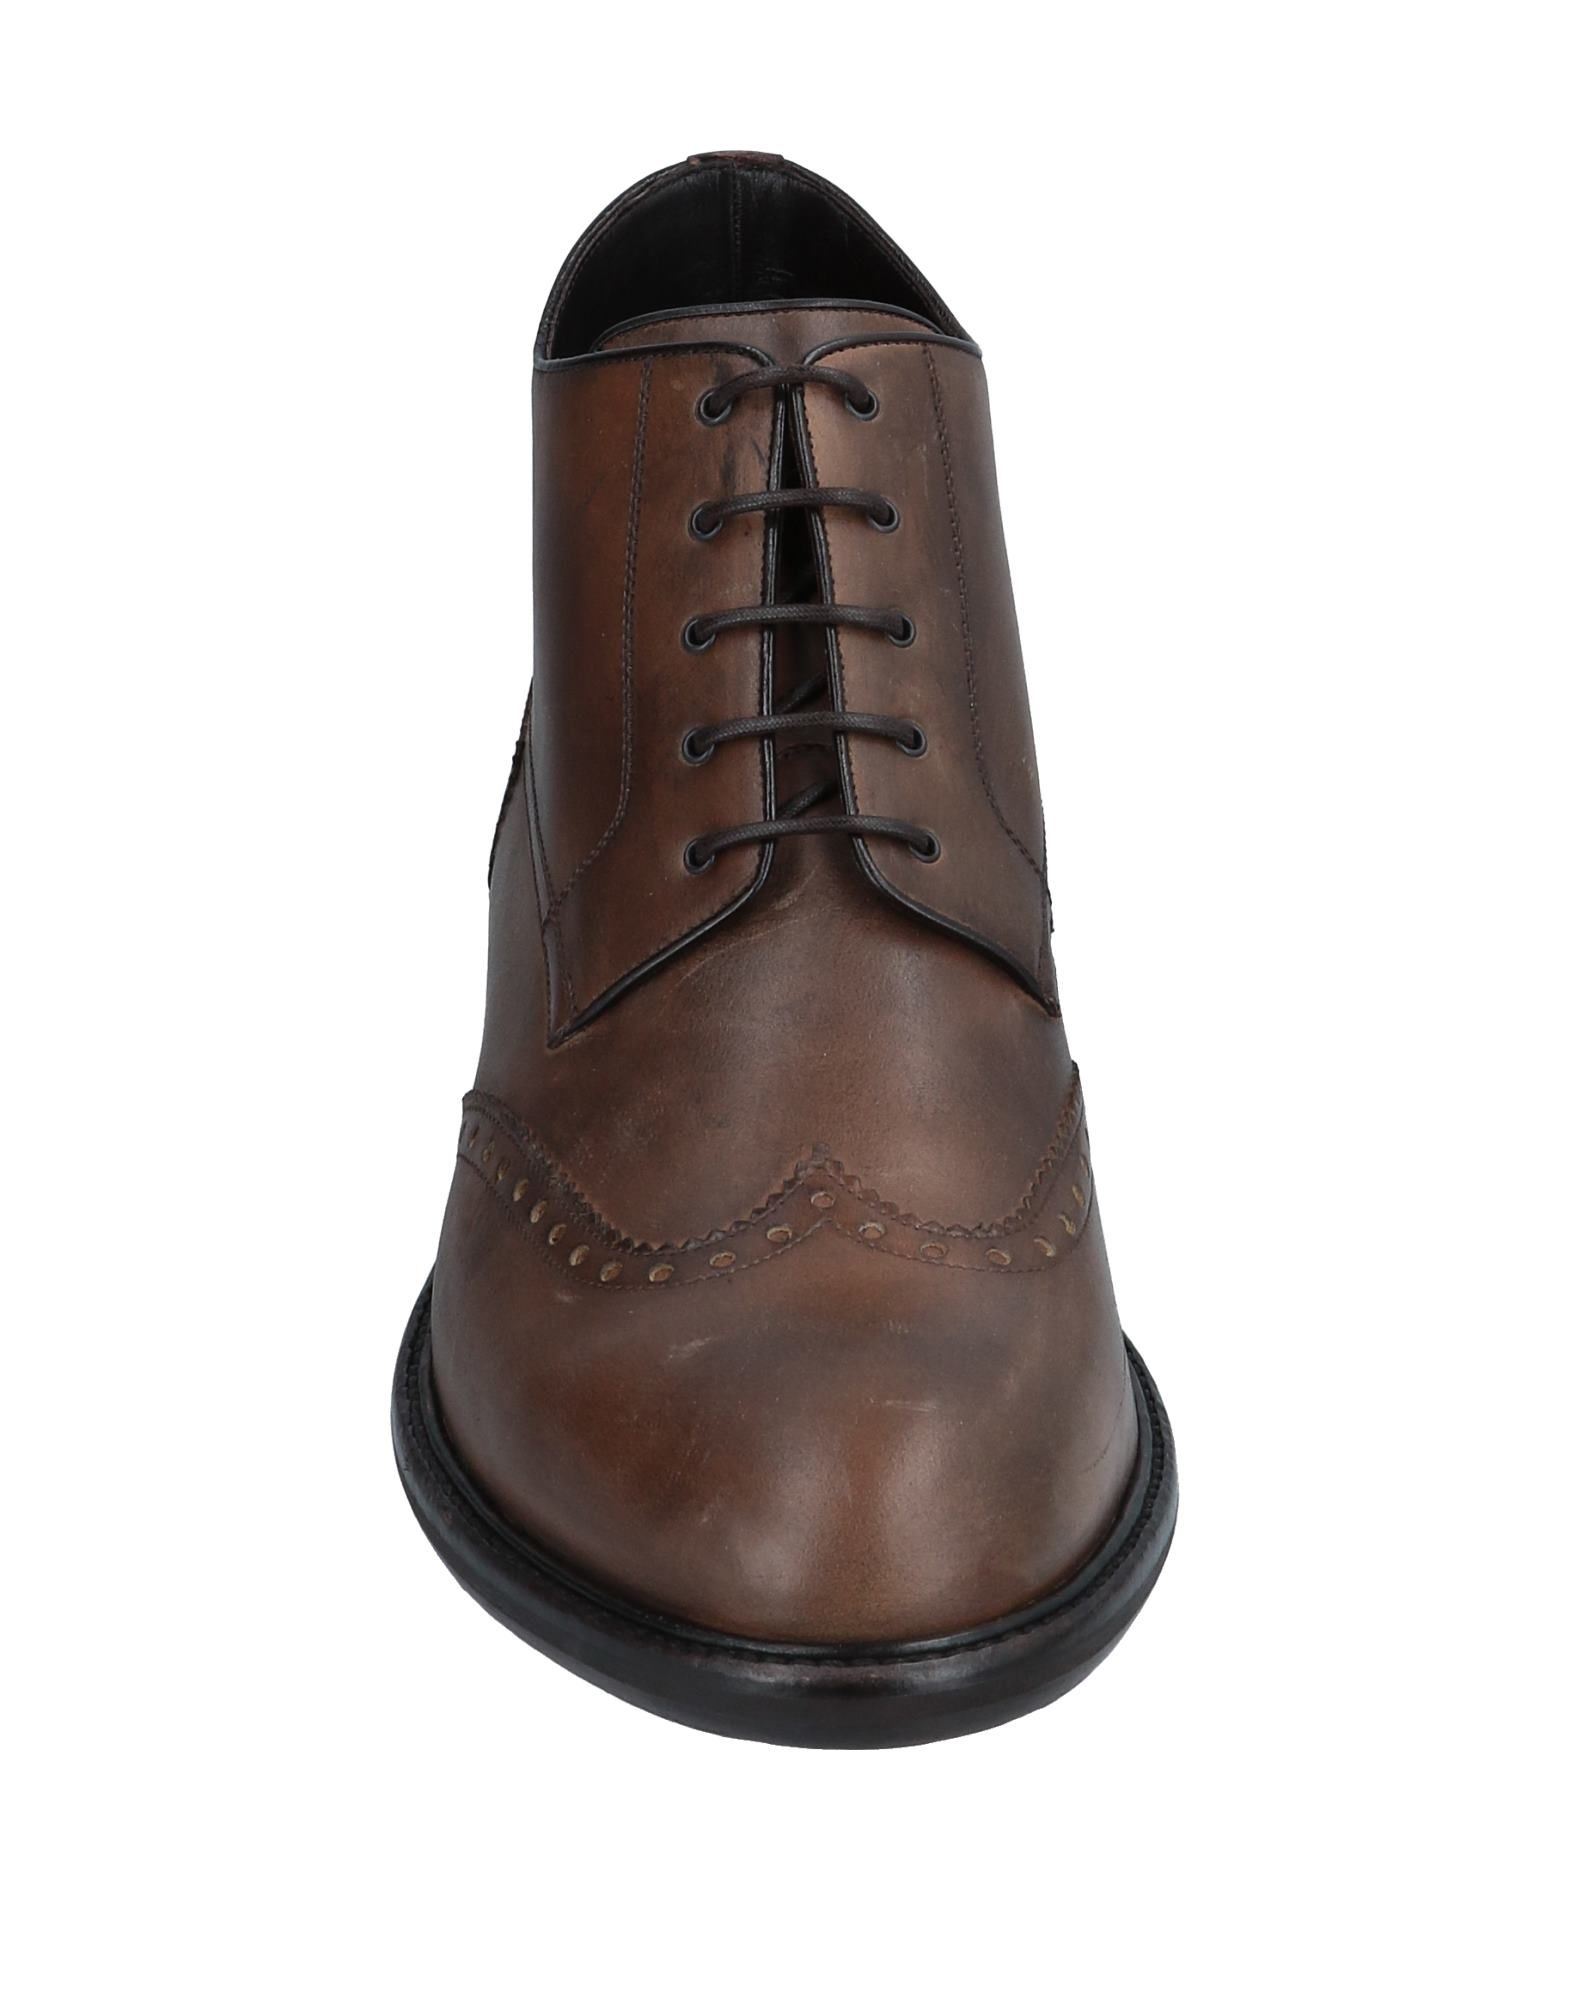 A.Testoni Stiefelette Herren  Schuhe 11543757IQ Gute Qualität beliebte Schuhe  449a71